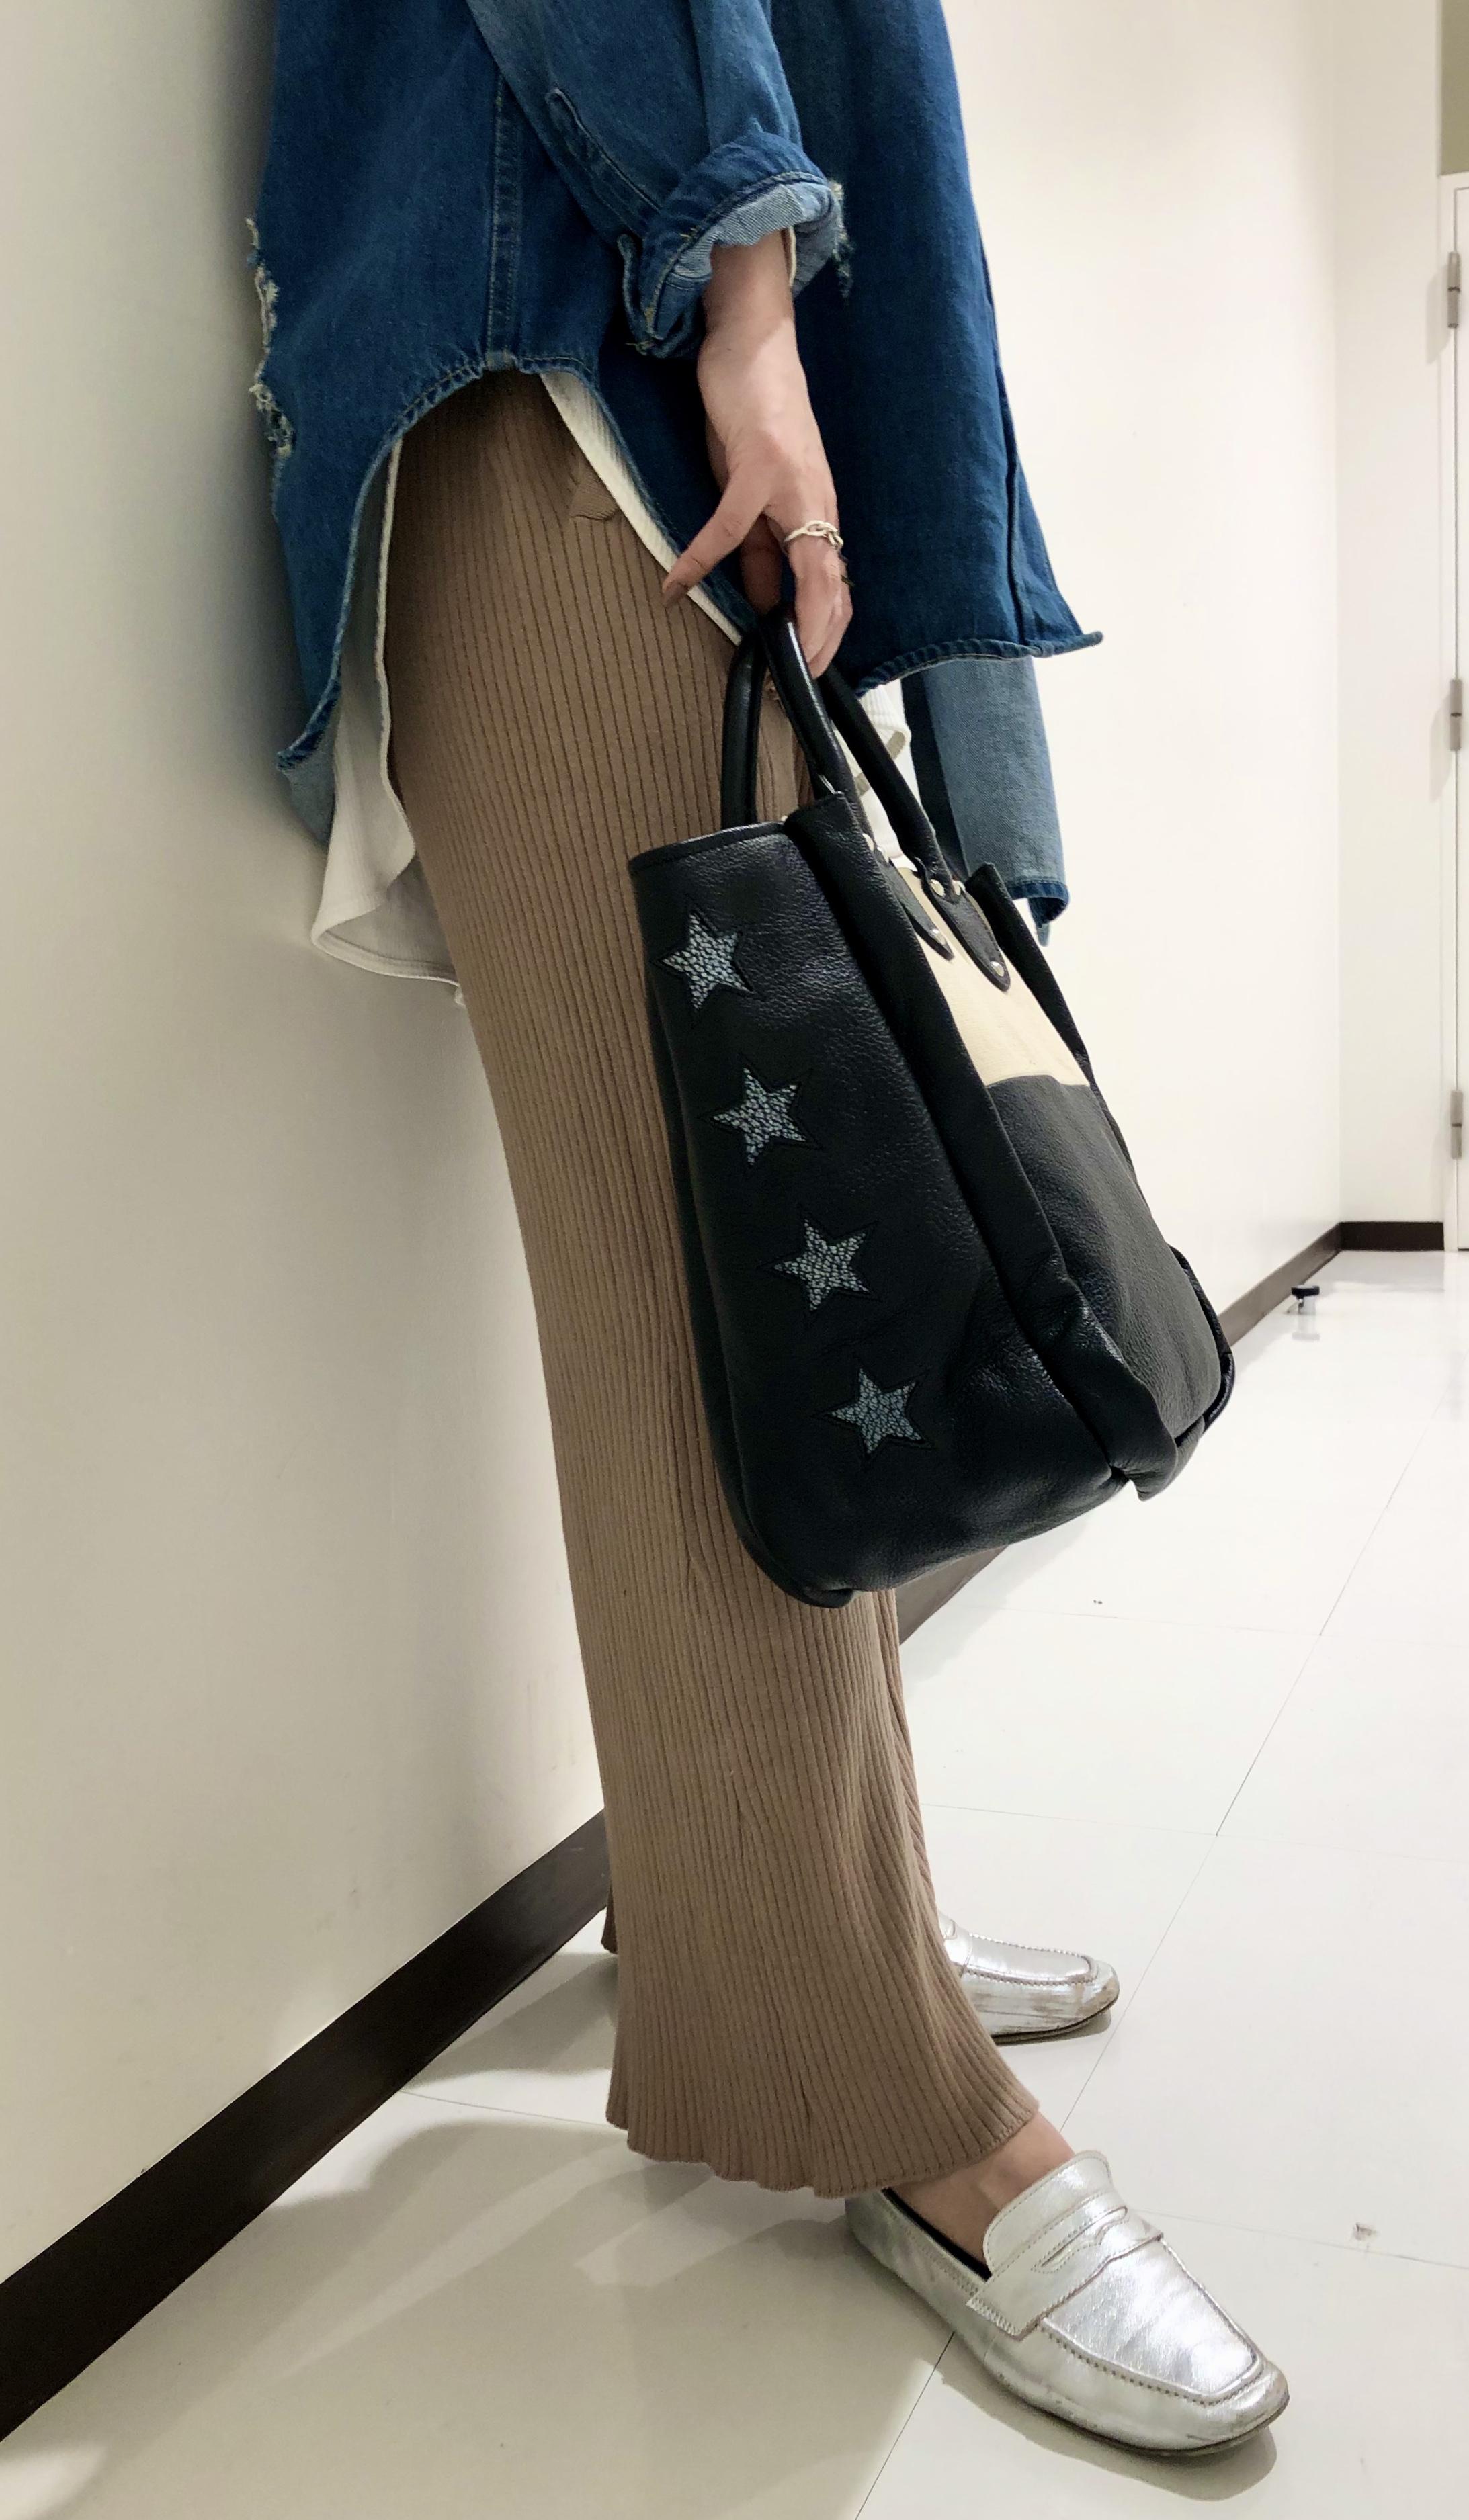 Scrap Book スクラップブック atneK アトネック トートバッグ tote bag キャンバス 牛革 綿 星 スター star ルミネ大宮 大宮ルミネ